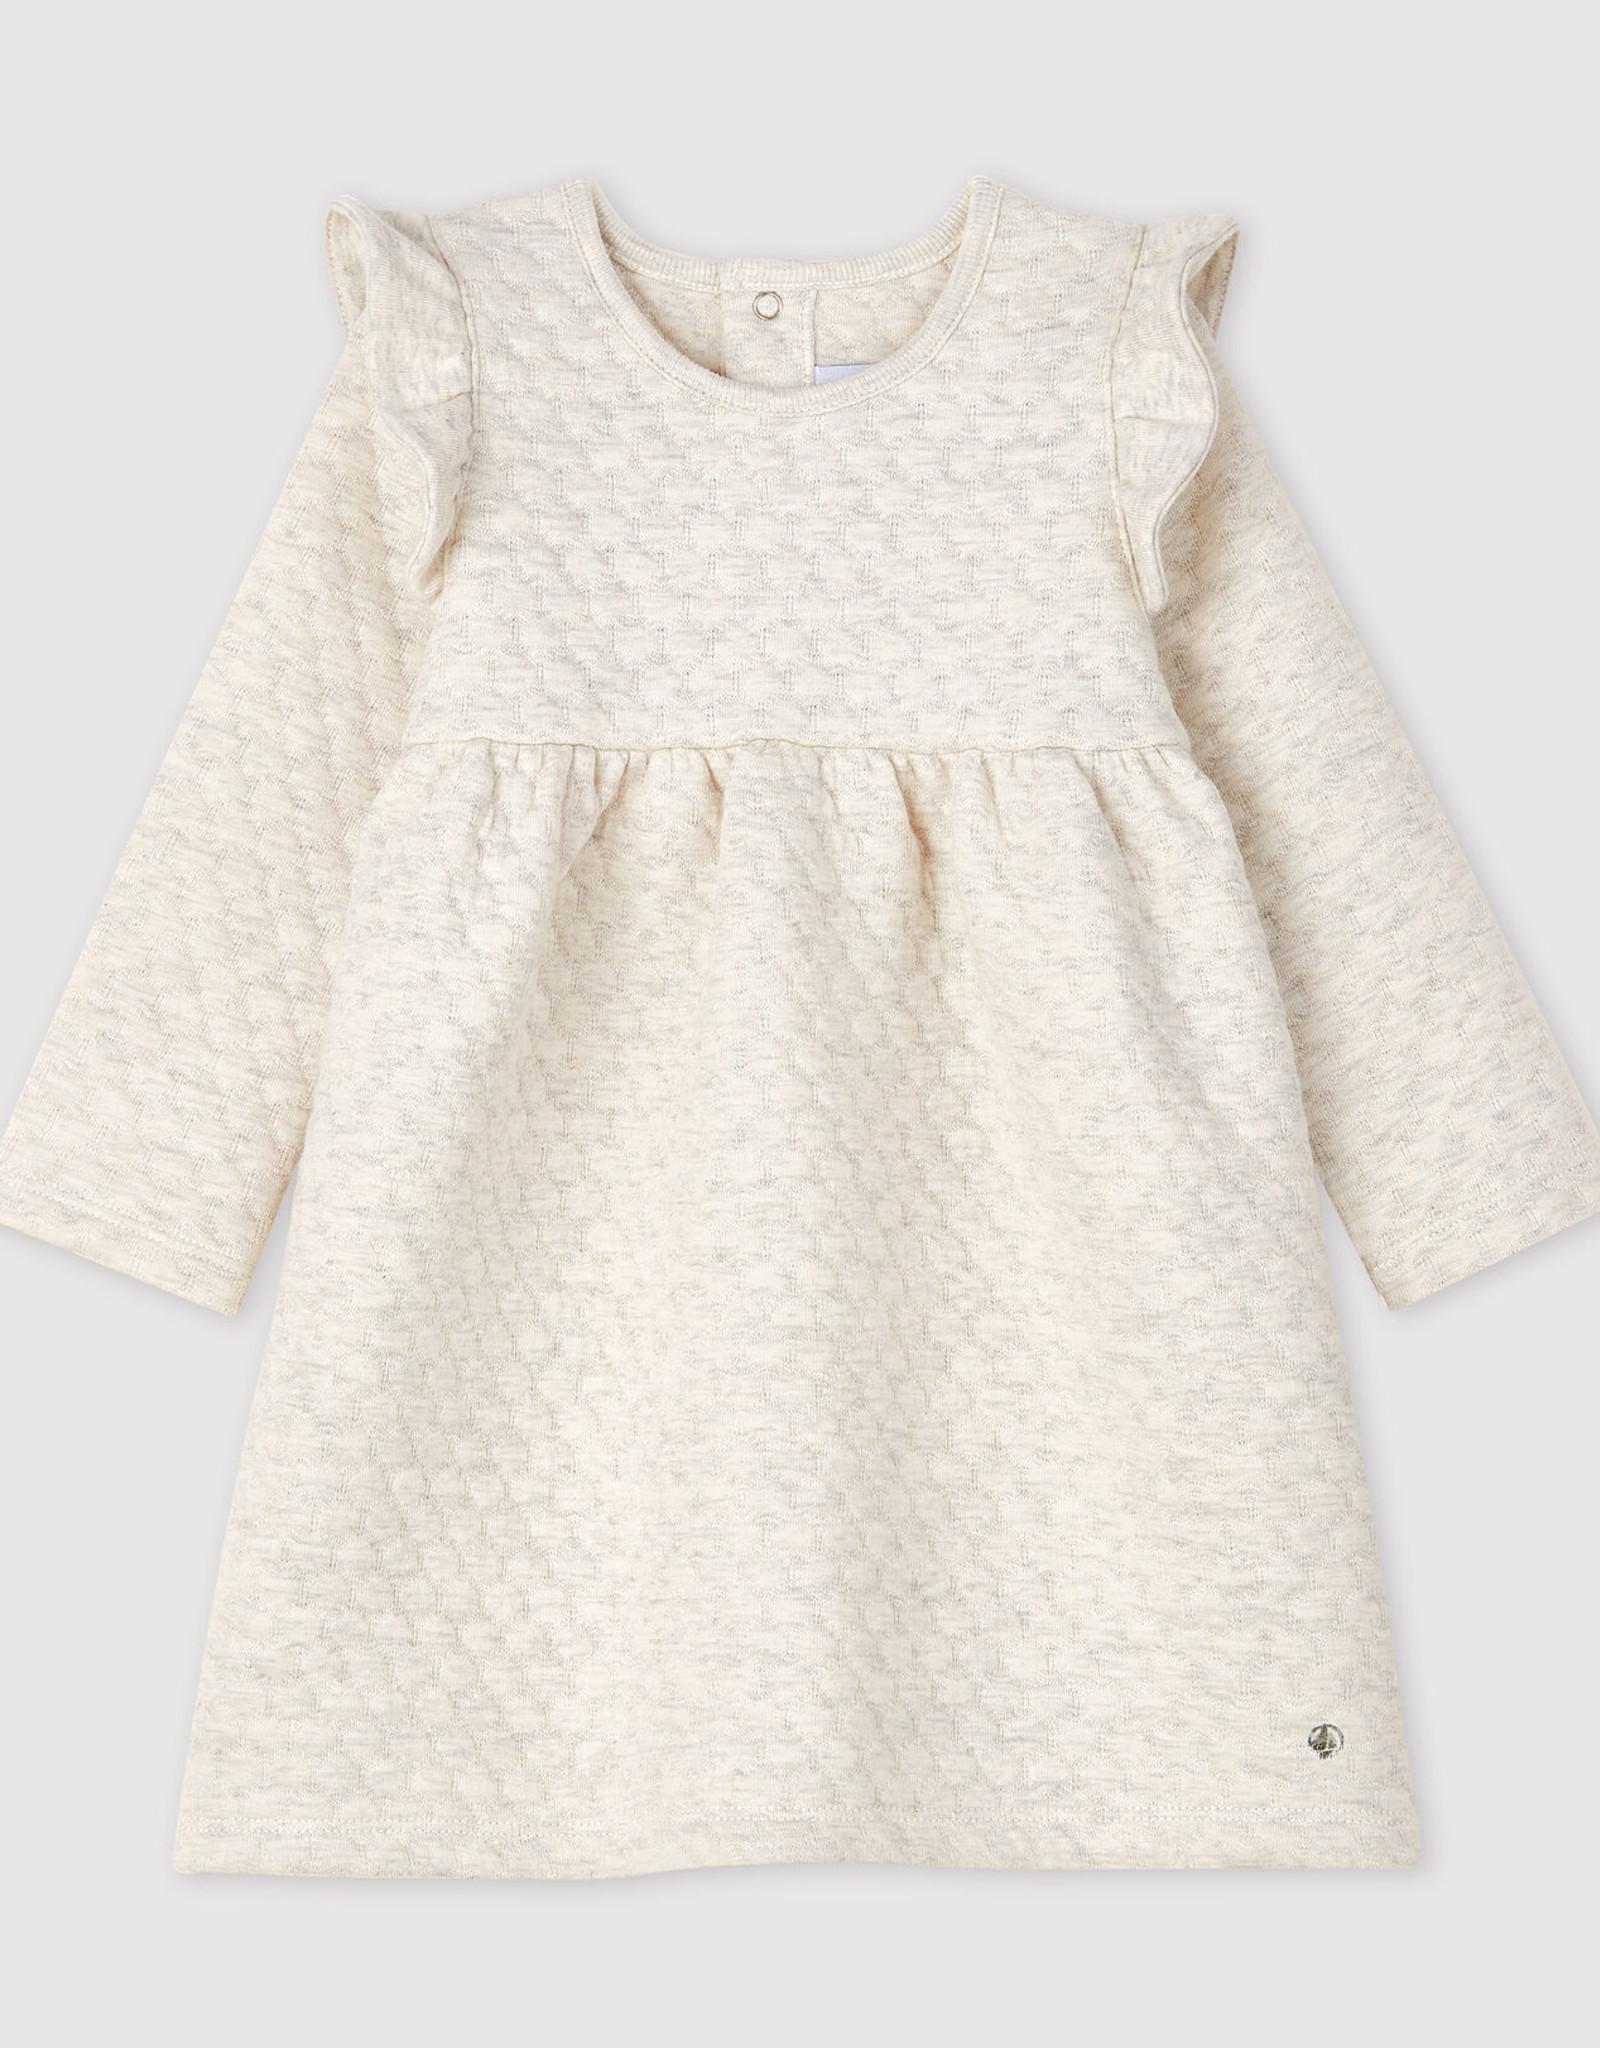 Petit Bateau Babies' dress